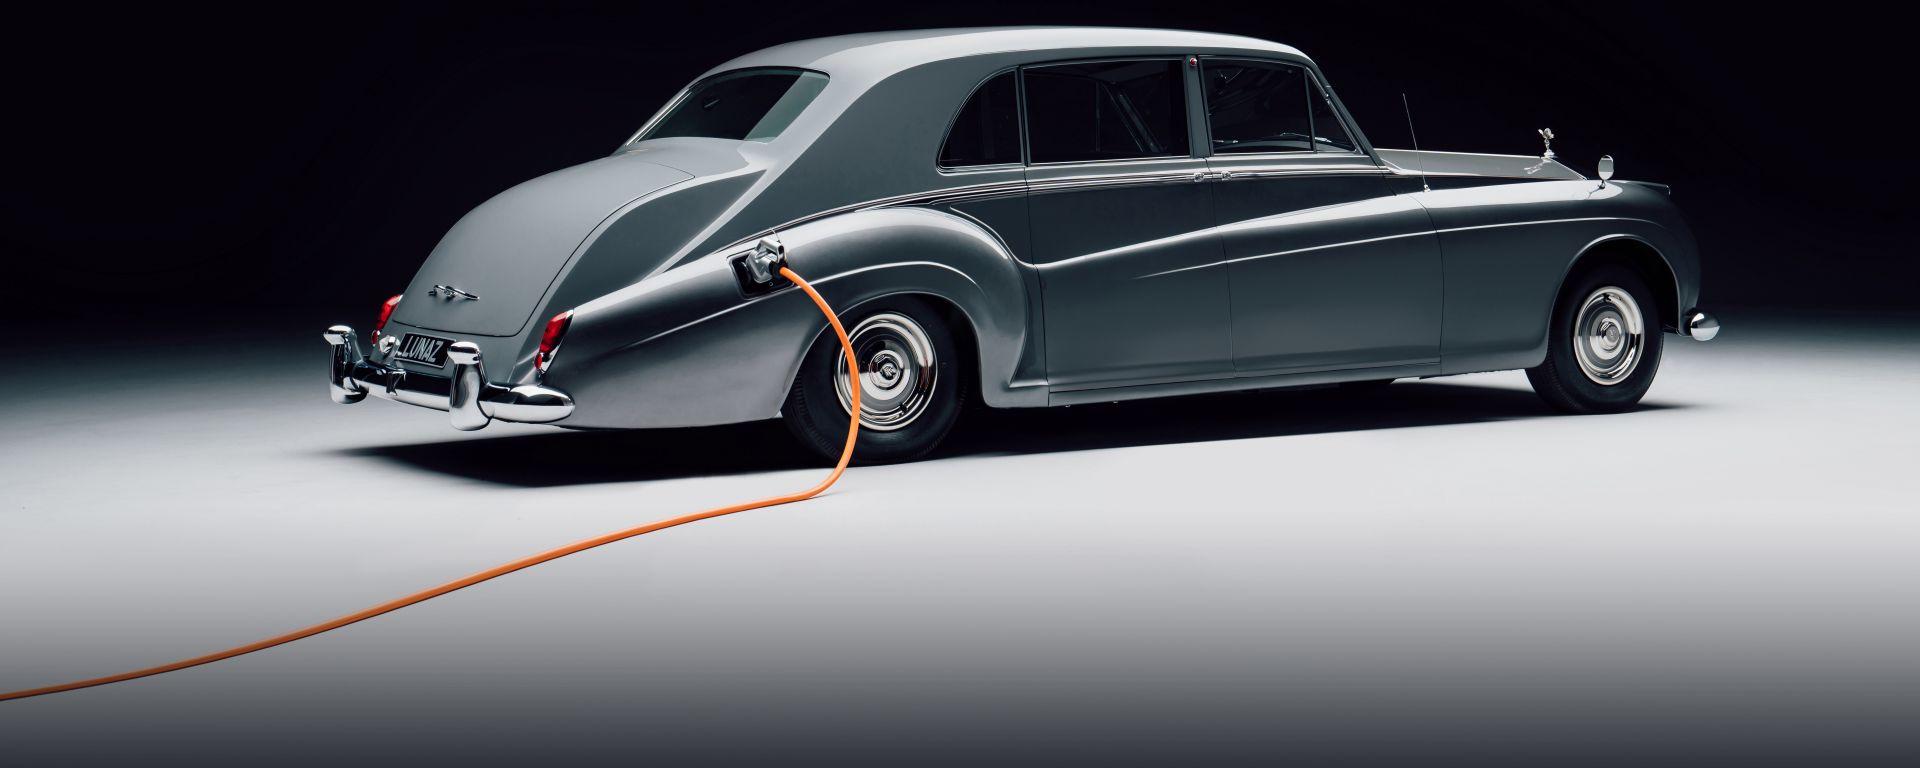 Rolls-Royce Phantom V by Lunaz Design